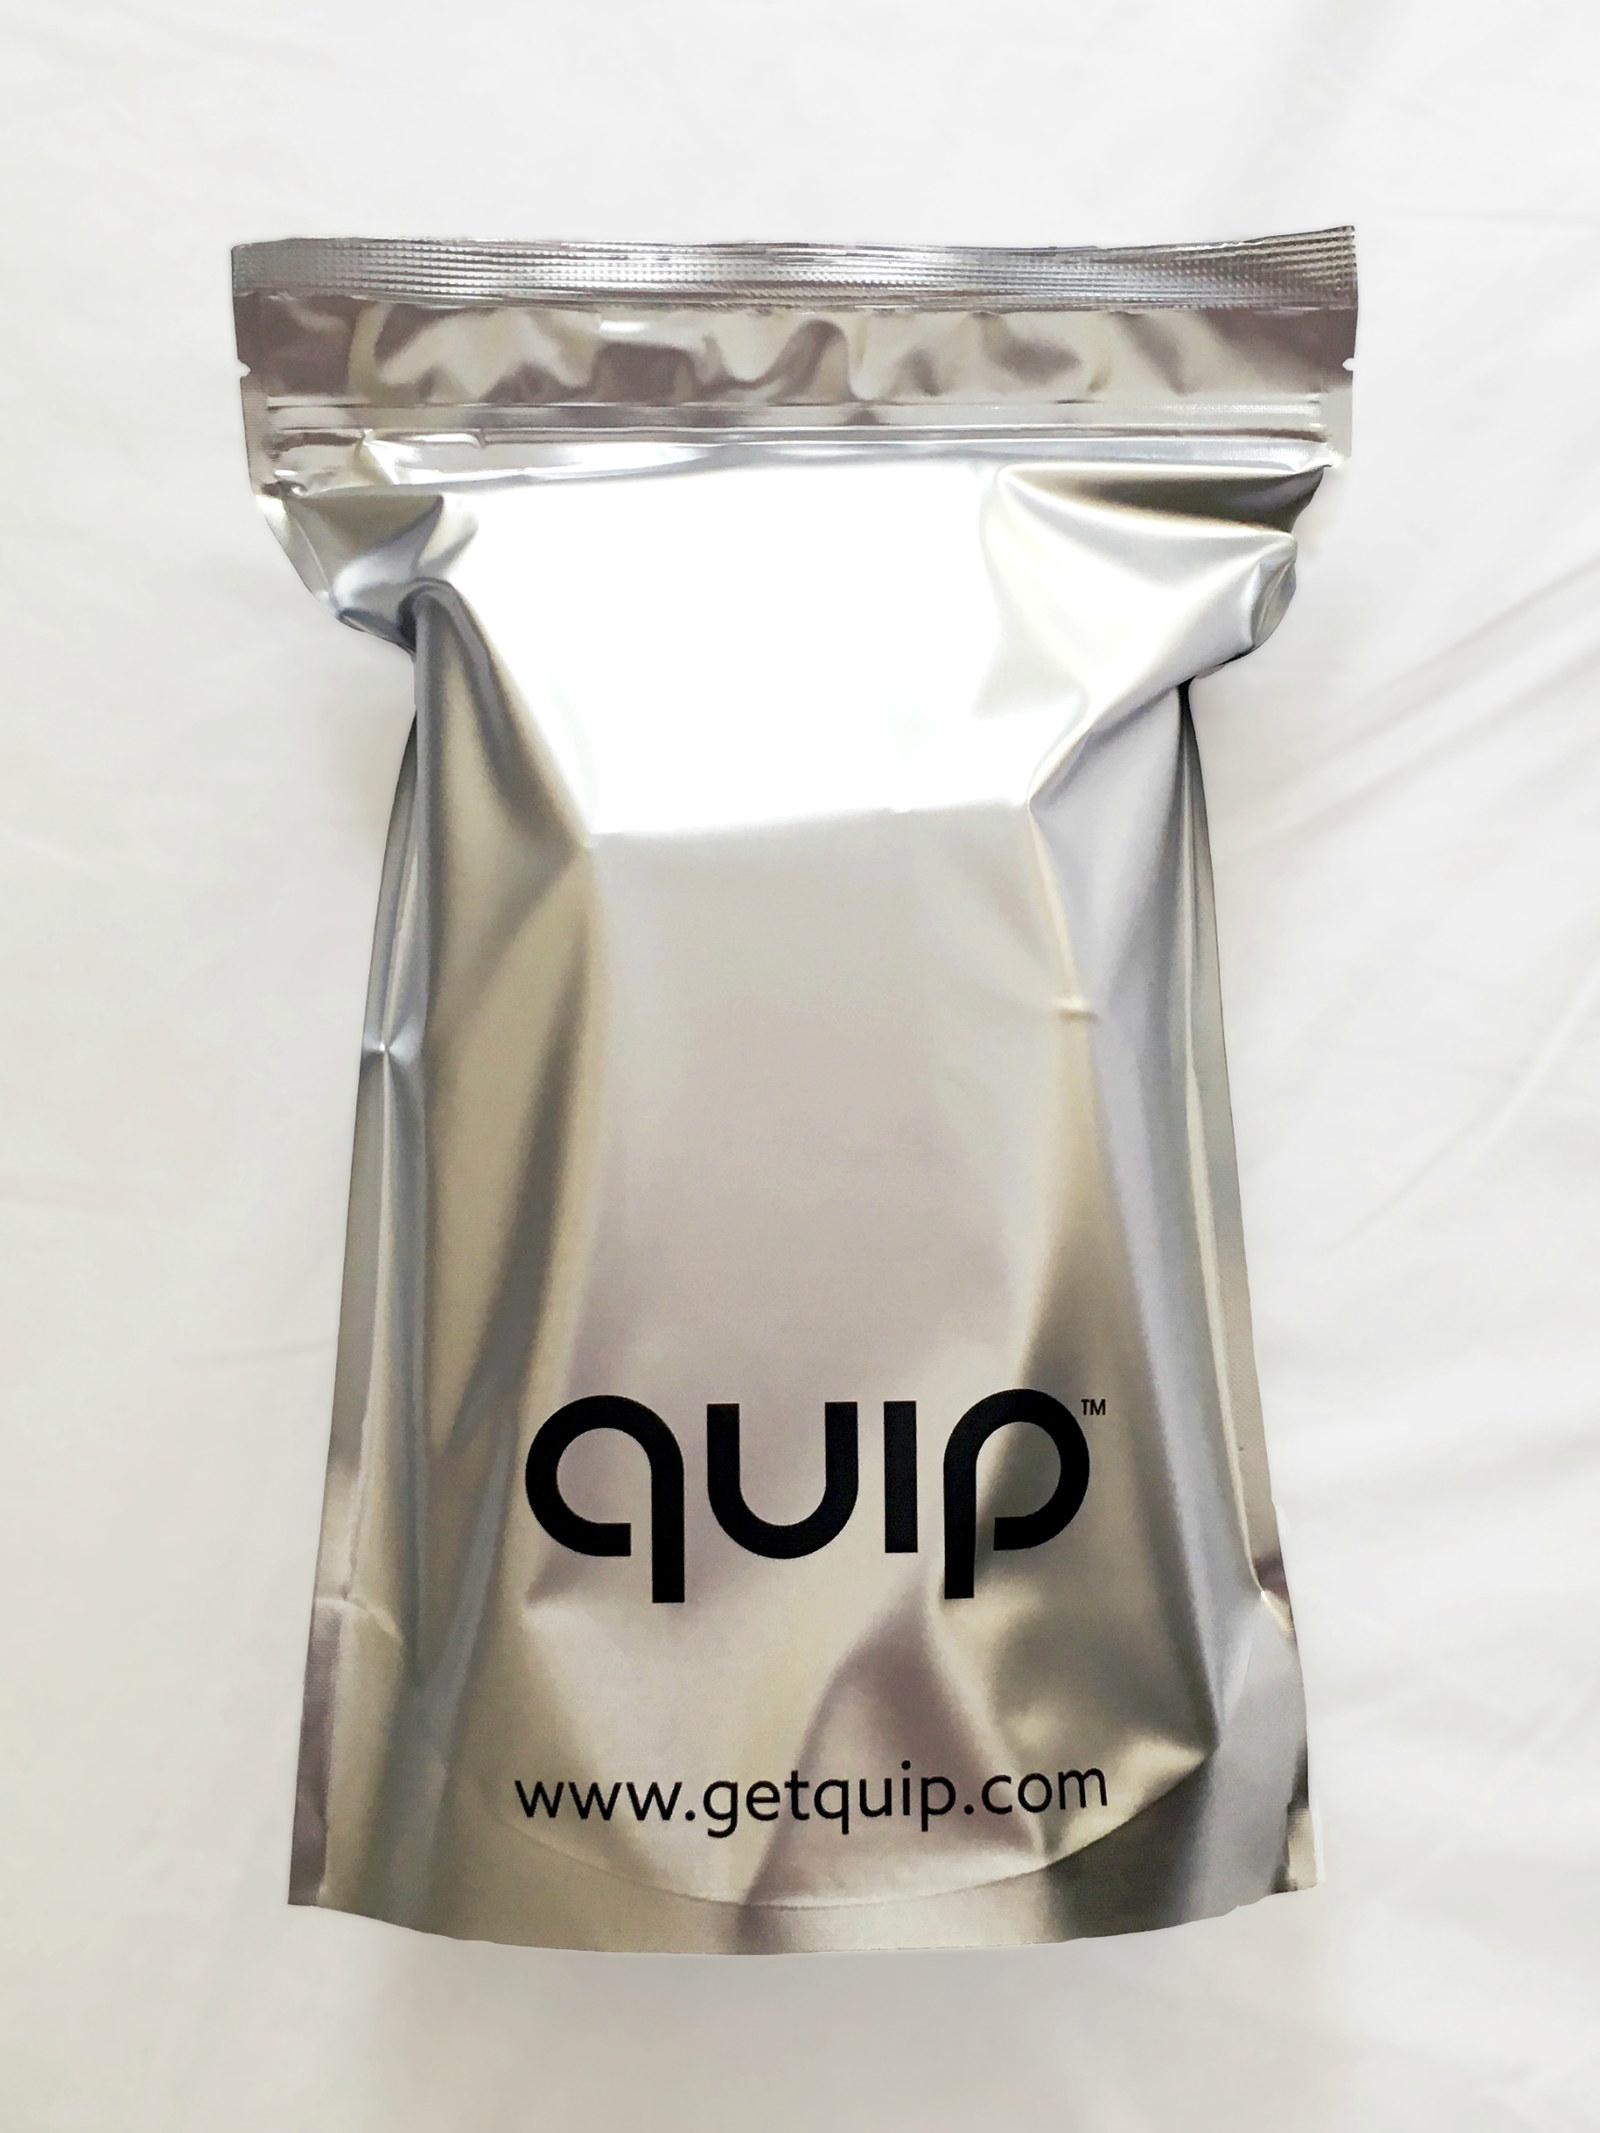 Quip nude text